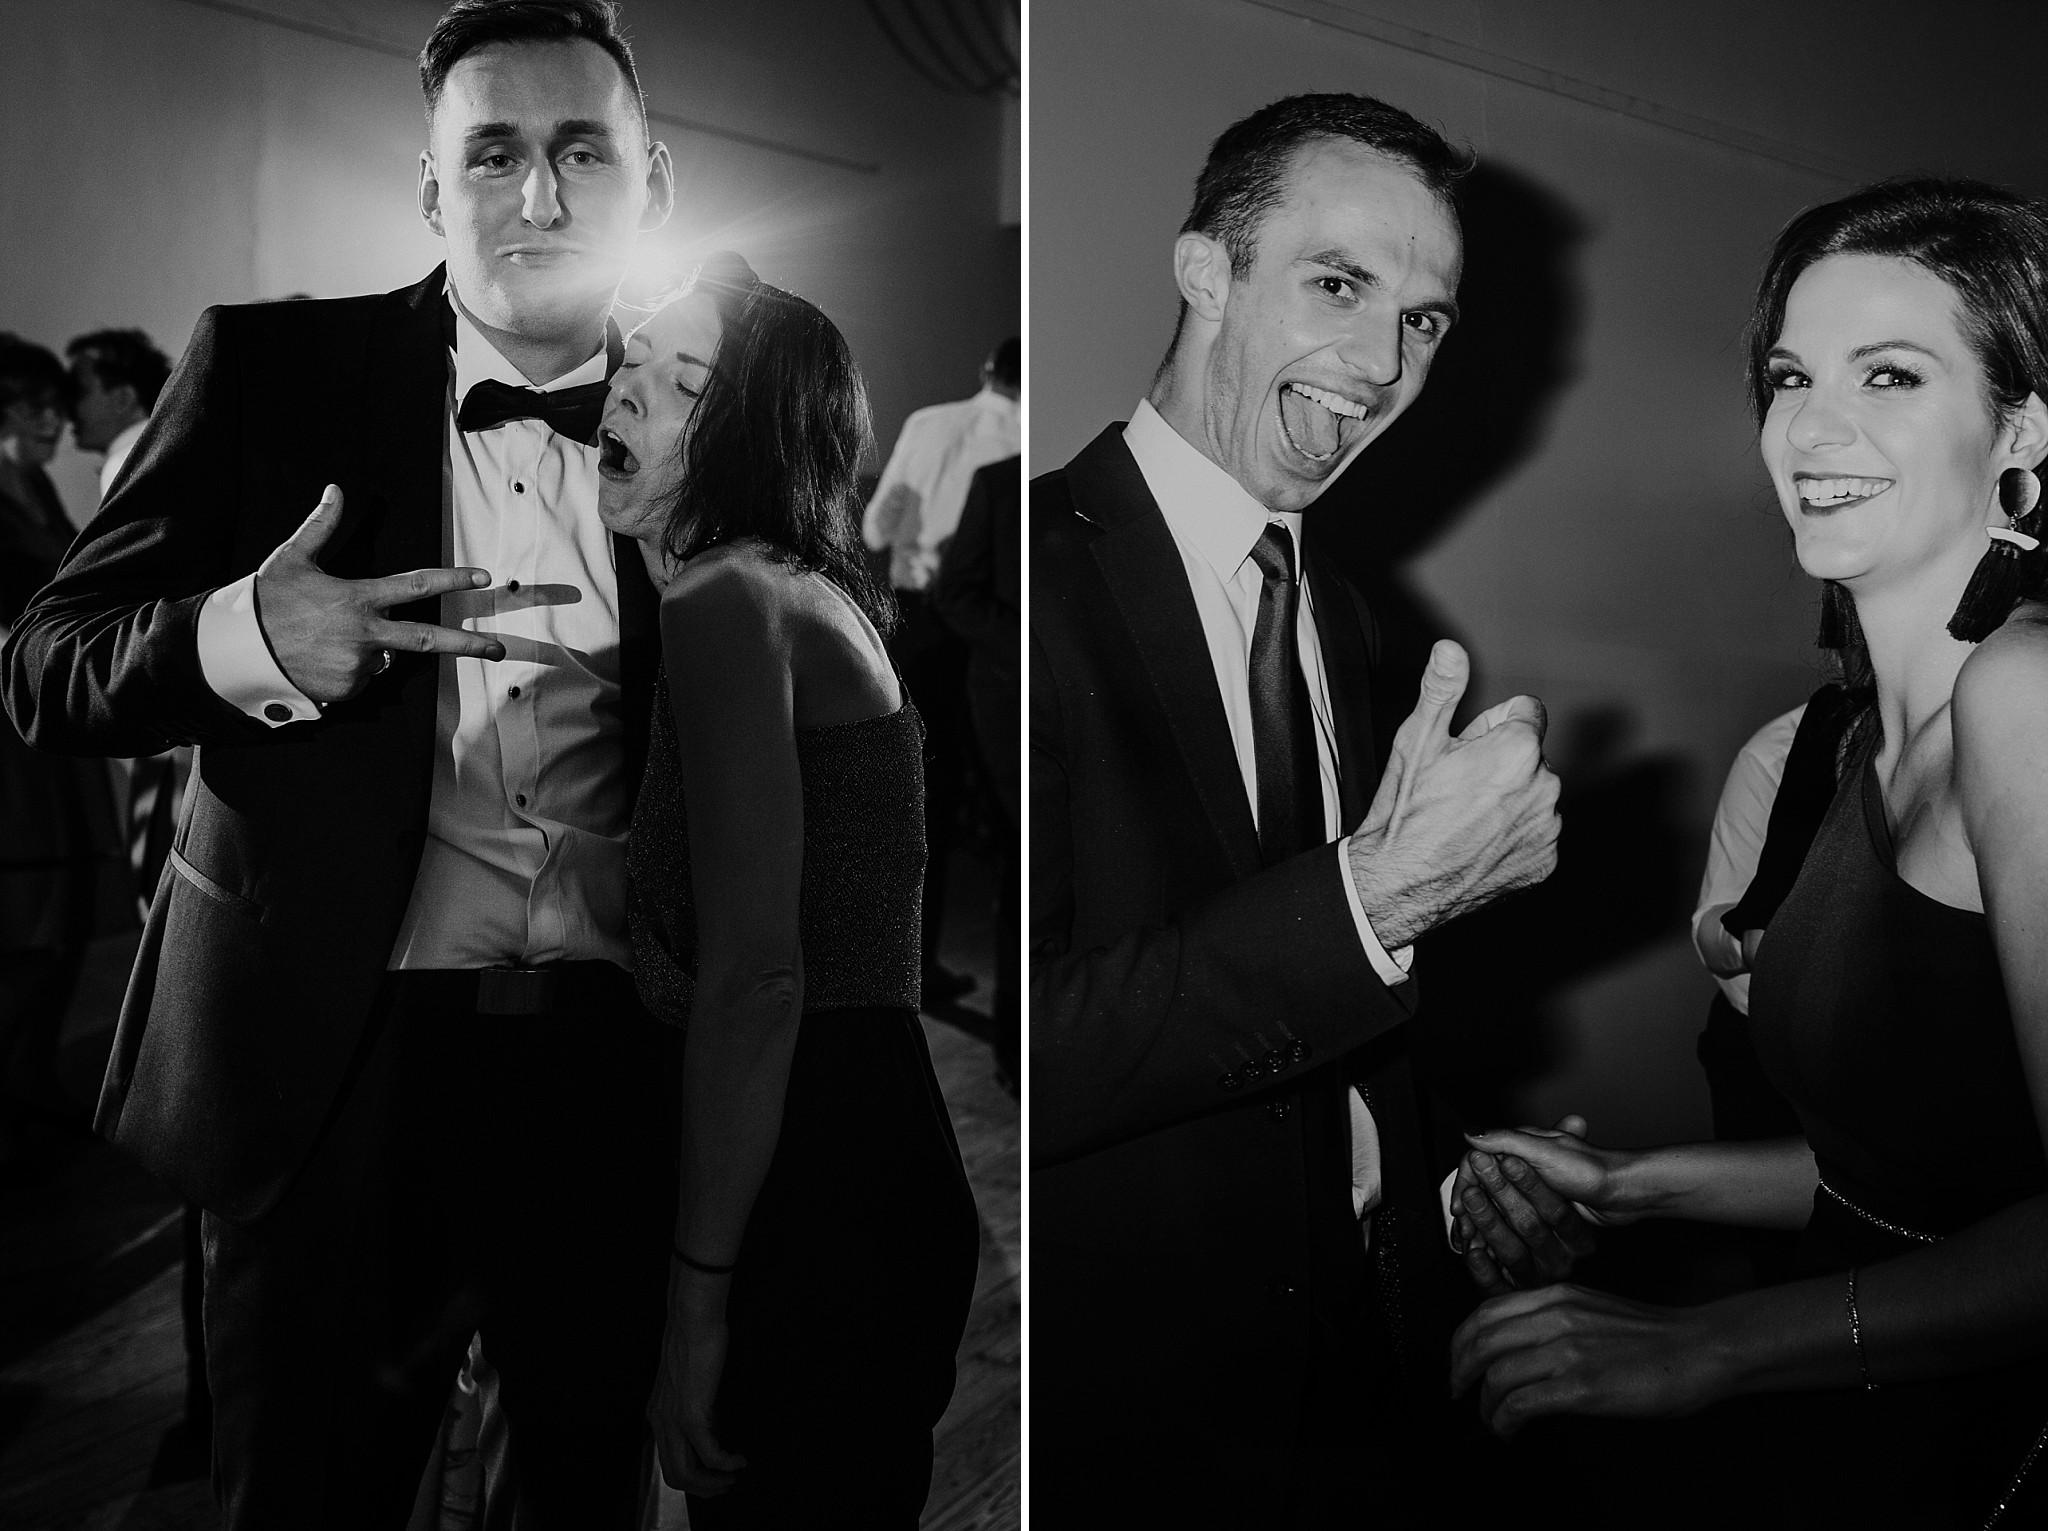 fotograf poznan wesele dobra truskawka piekne wesele pod poznaniem wesele w dobrej truskawce piekna para mloda slub marzen slub koronawirus slub listopad wesele koronawirus 474